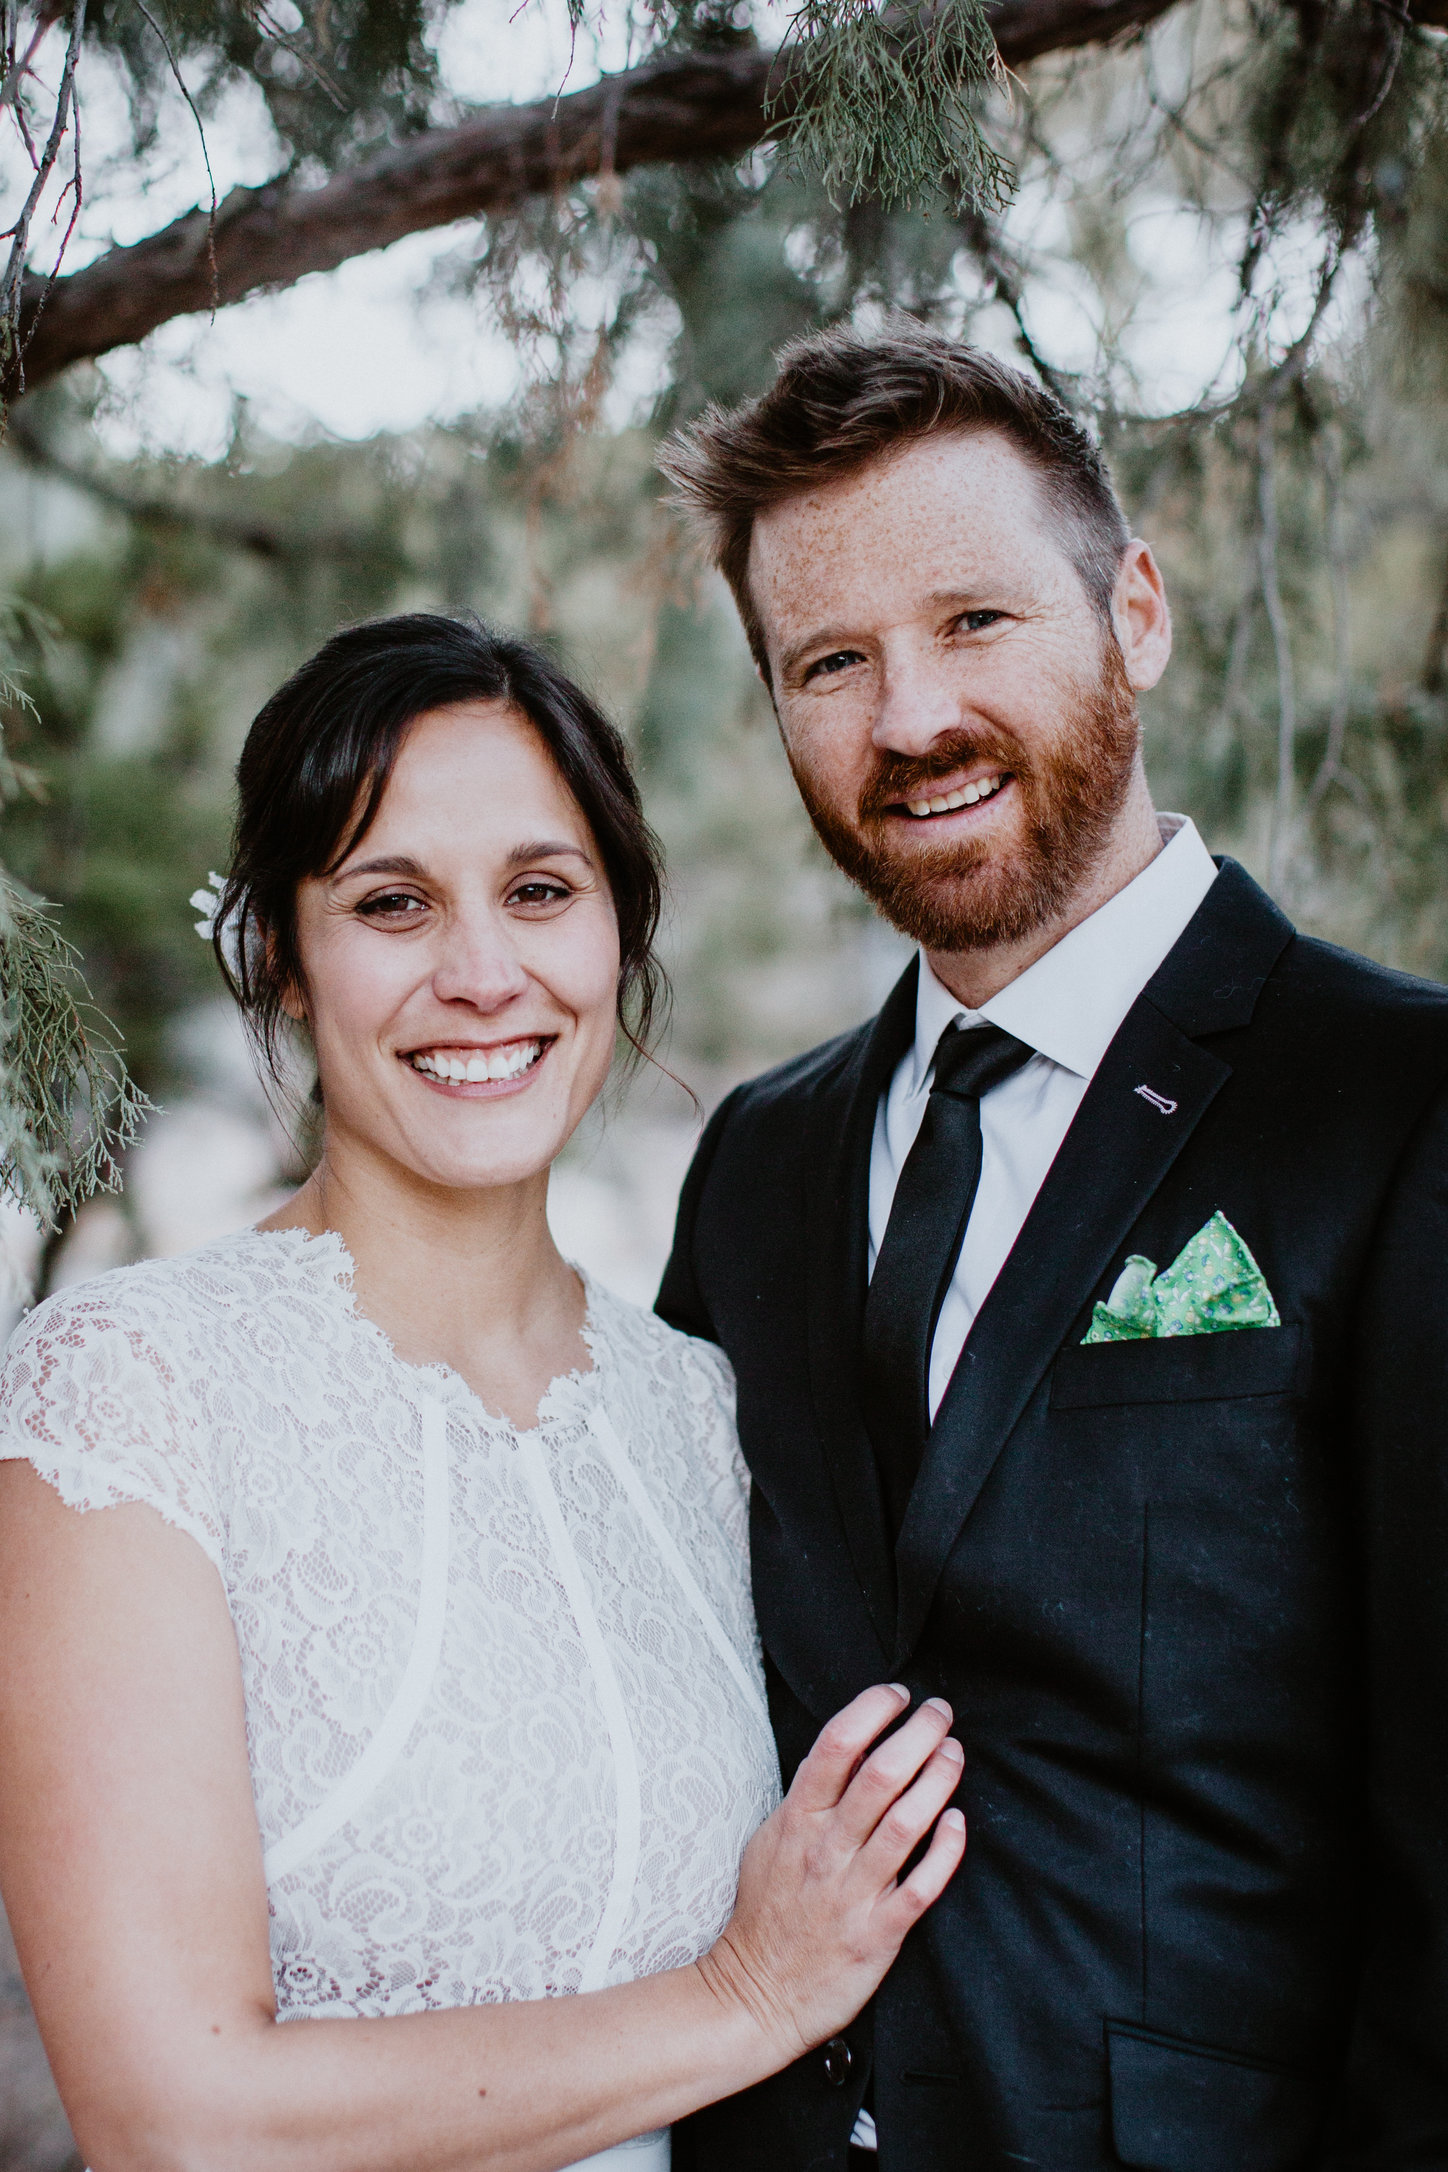 HandM-wedding-172.jpg